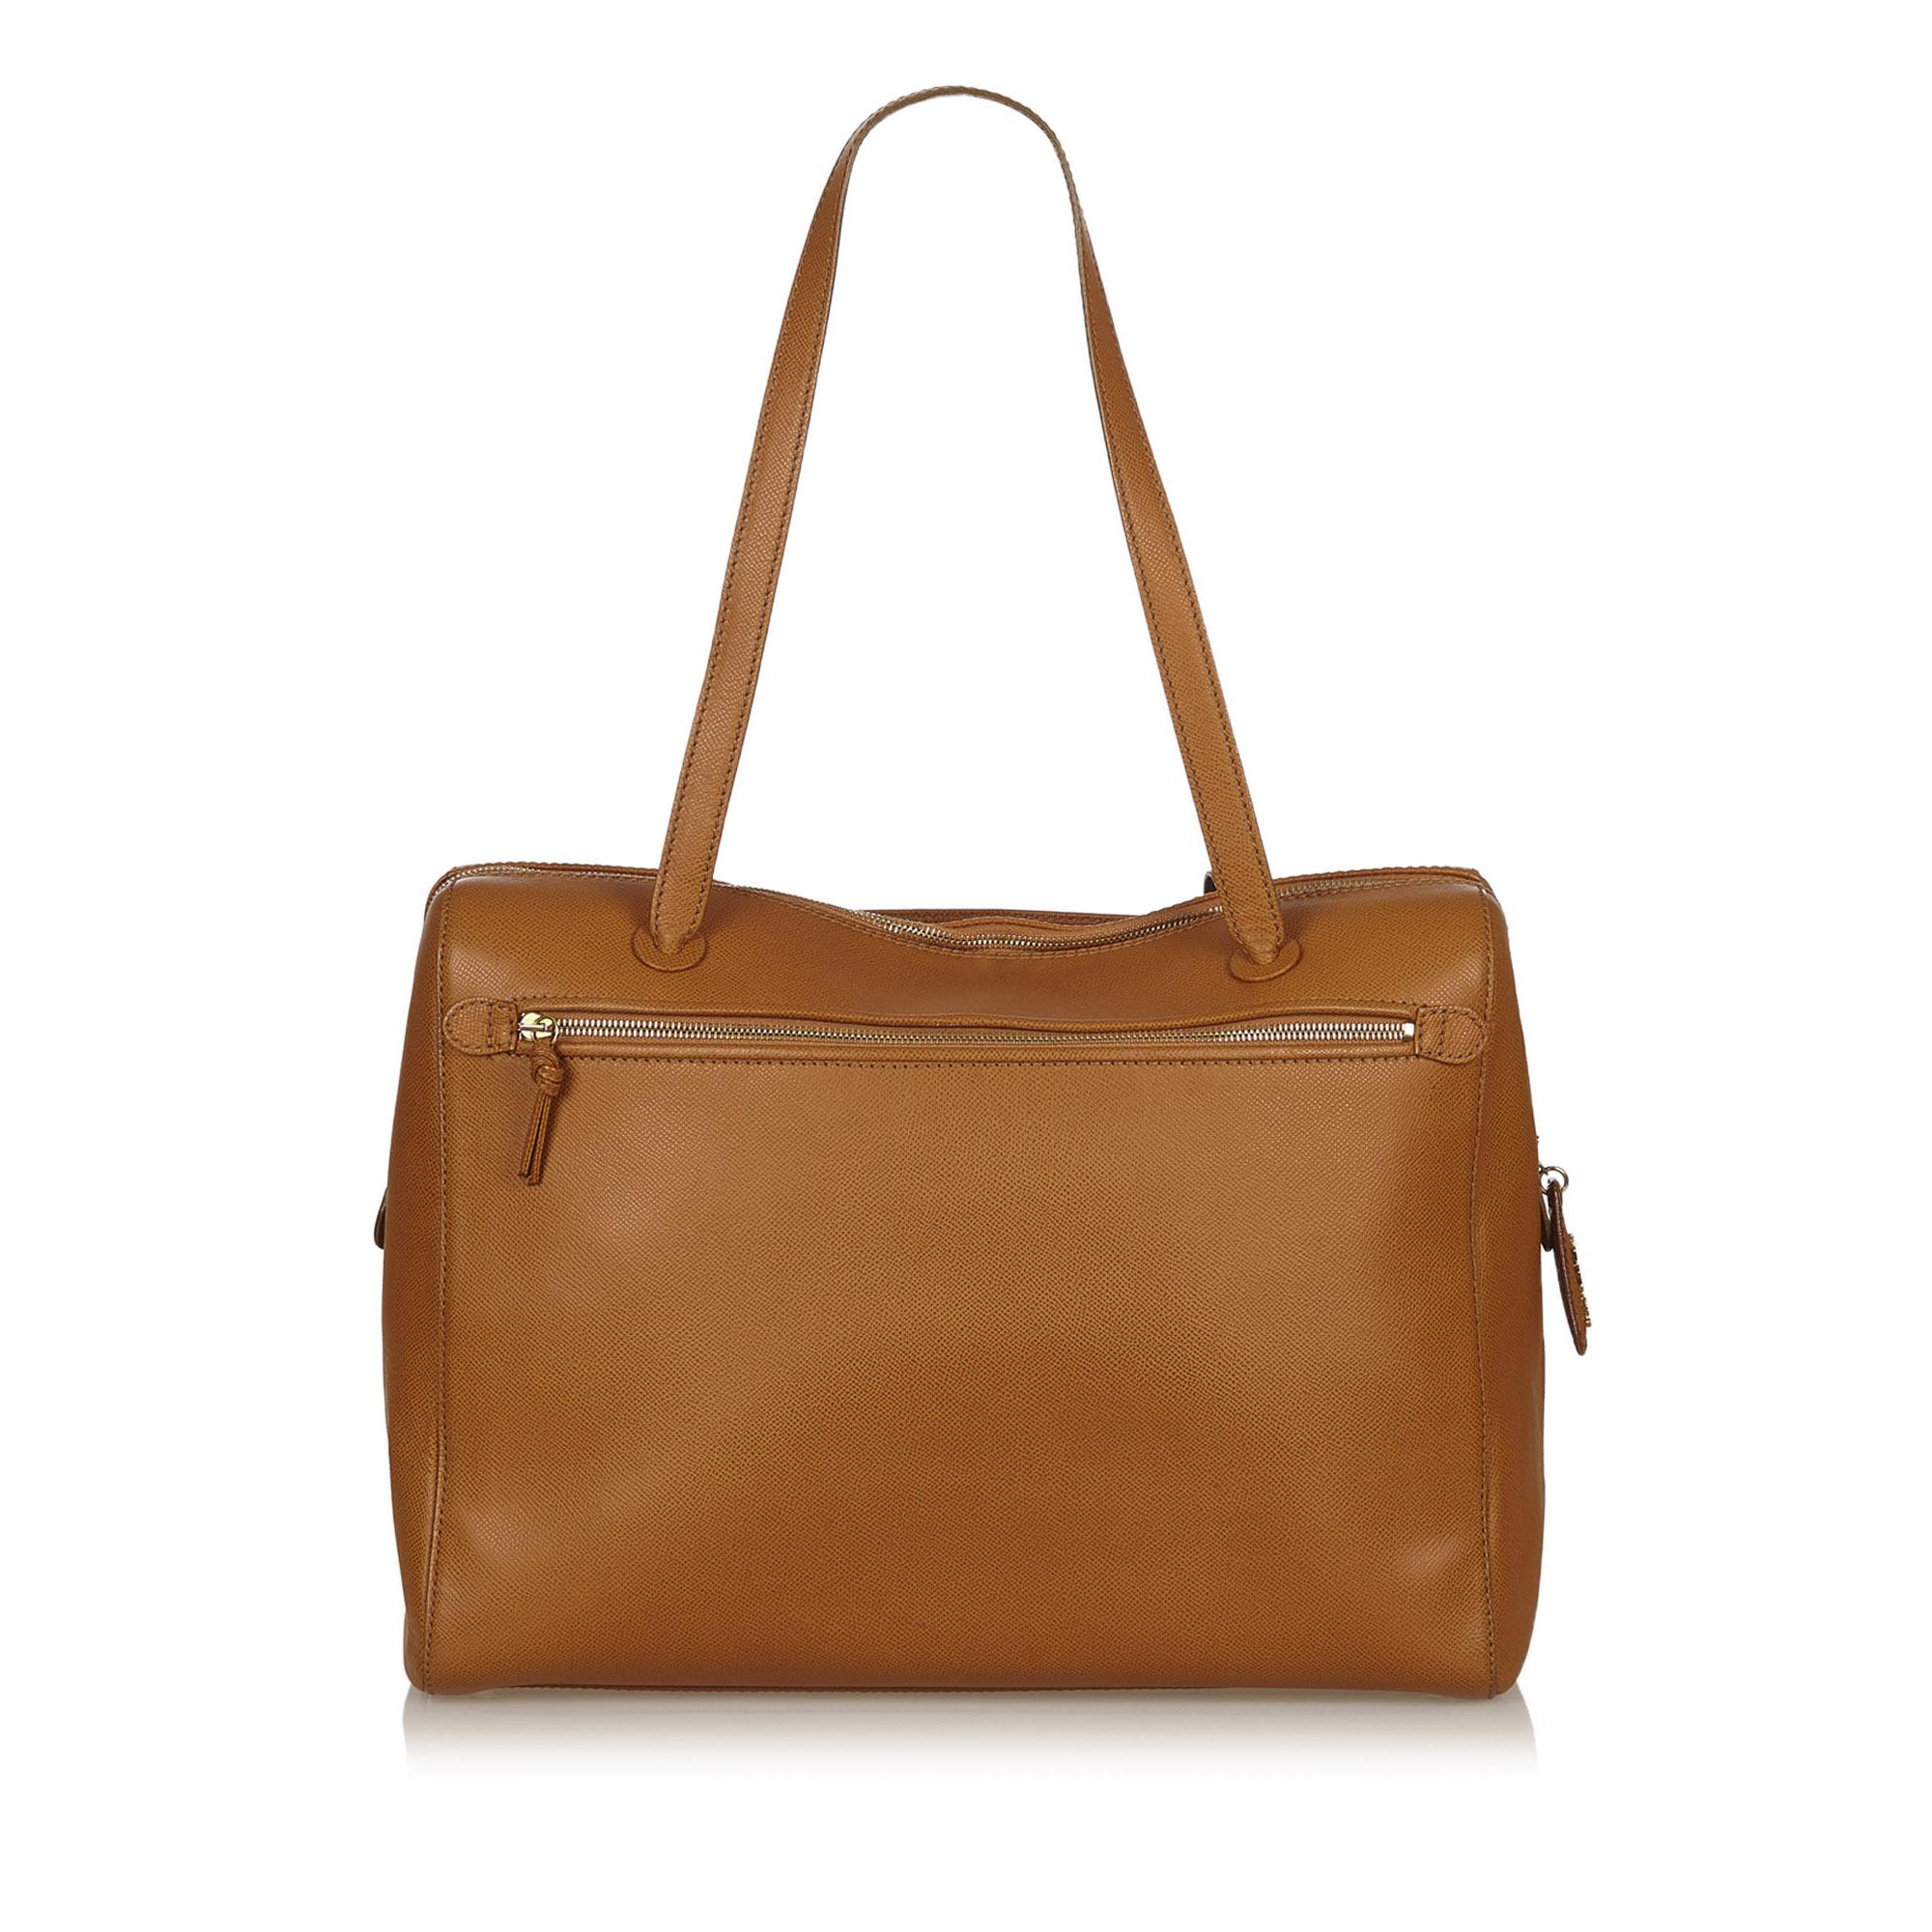 big sale unique style boy Chanel Brown Leather Vintage Shoulder Bag